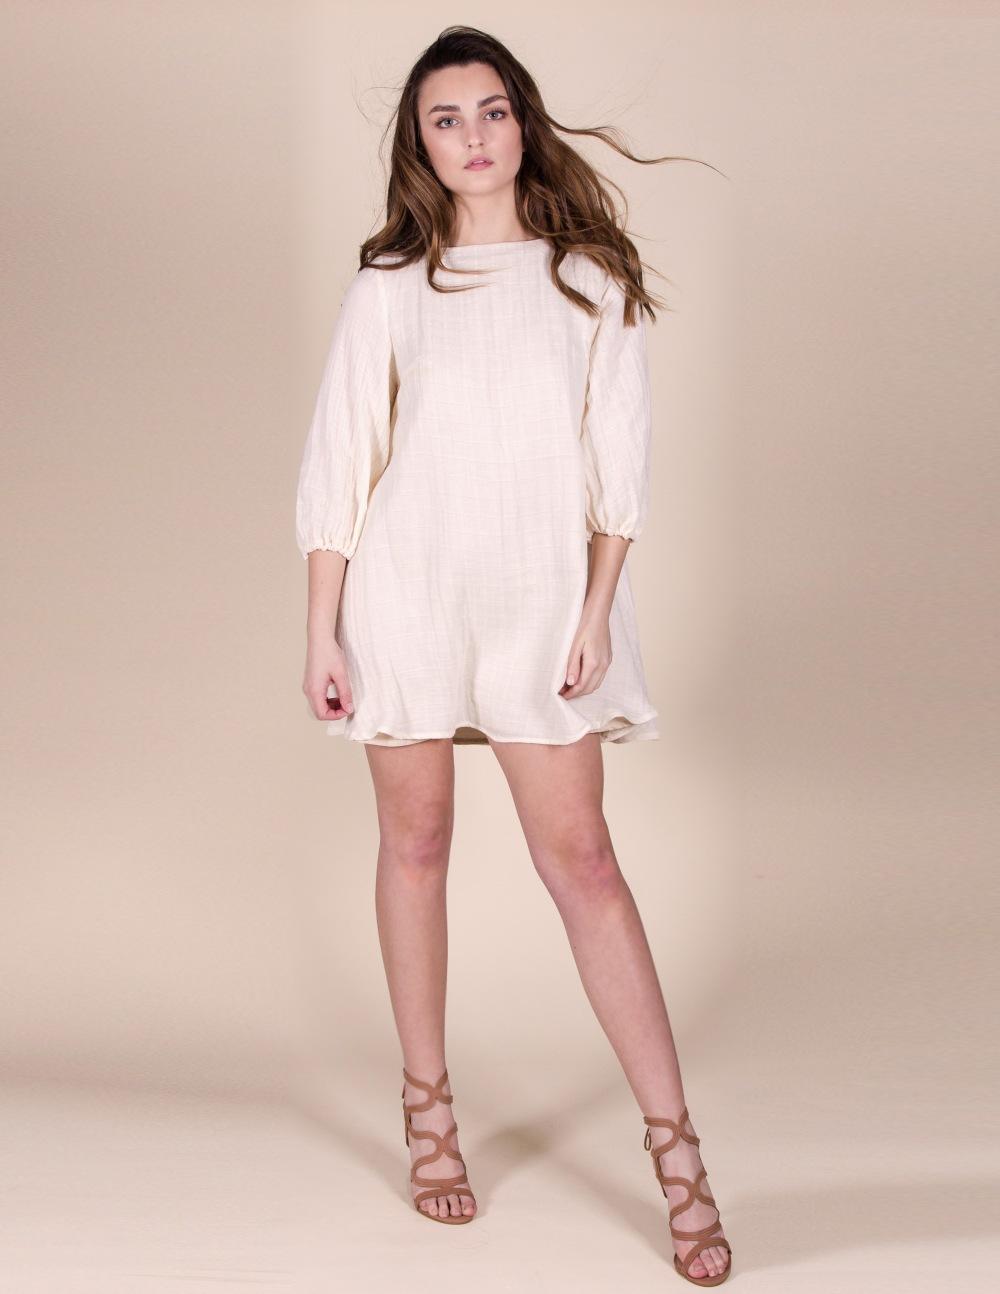 Alyssa Nicole The Haley Dress 3